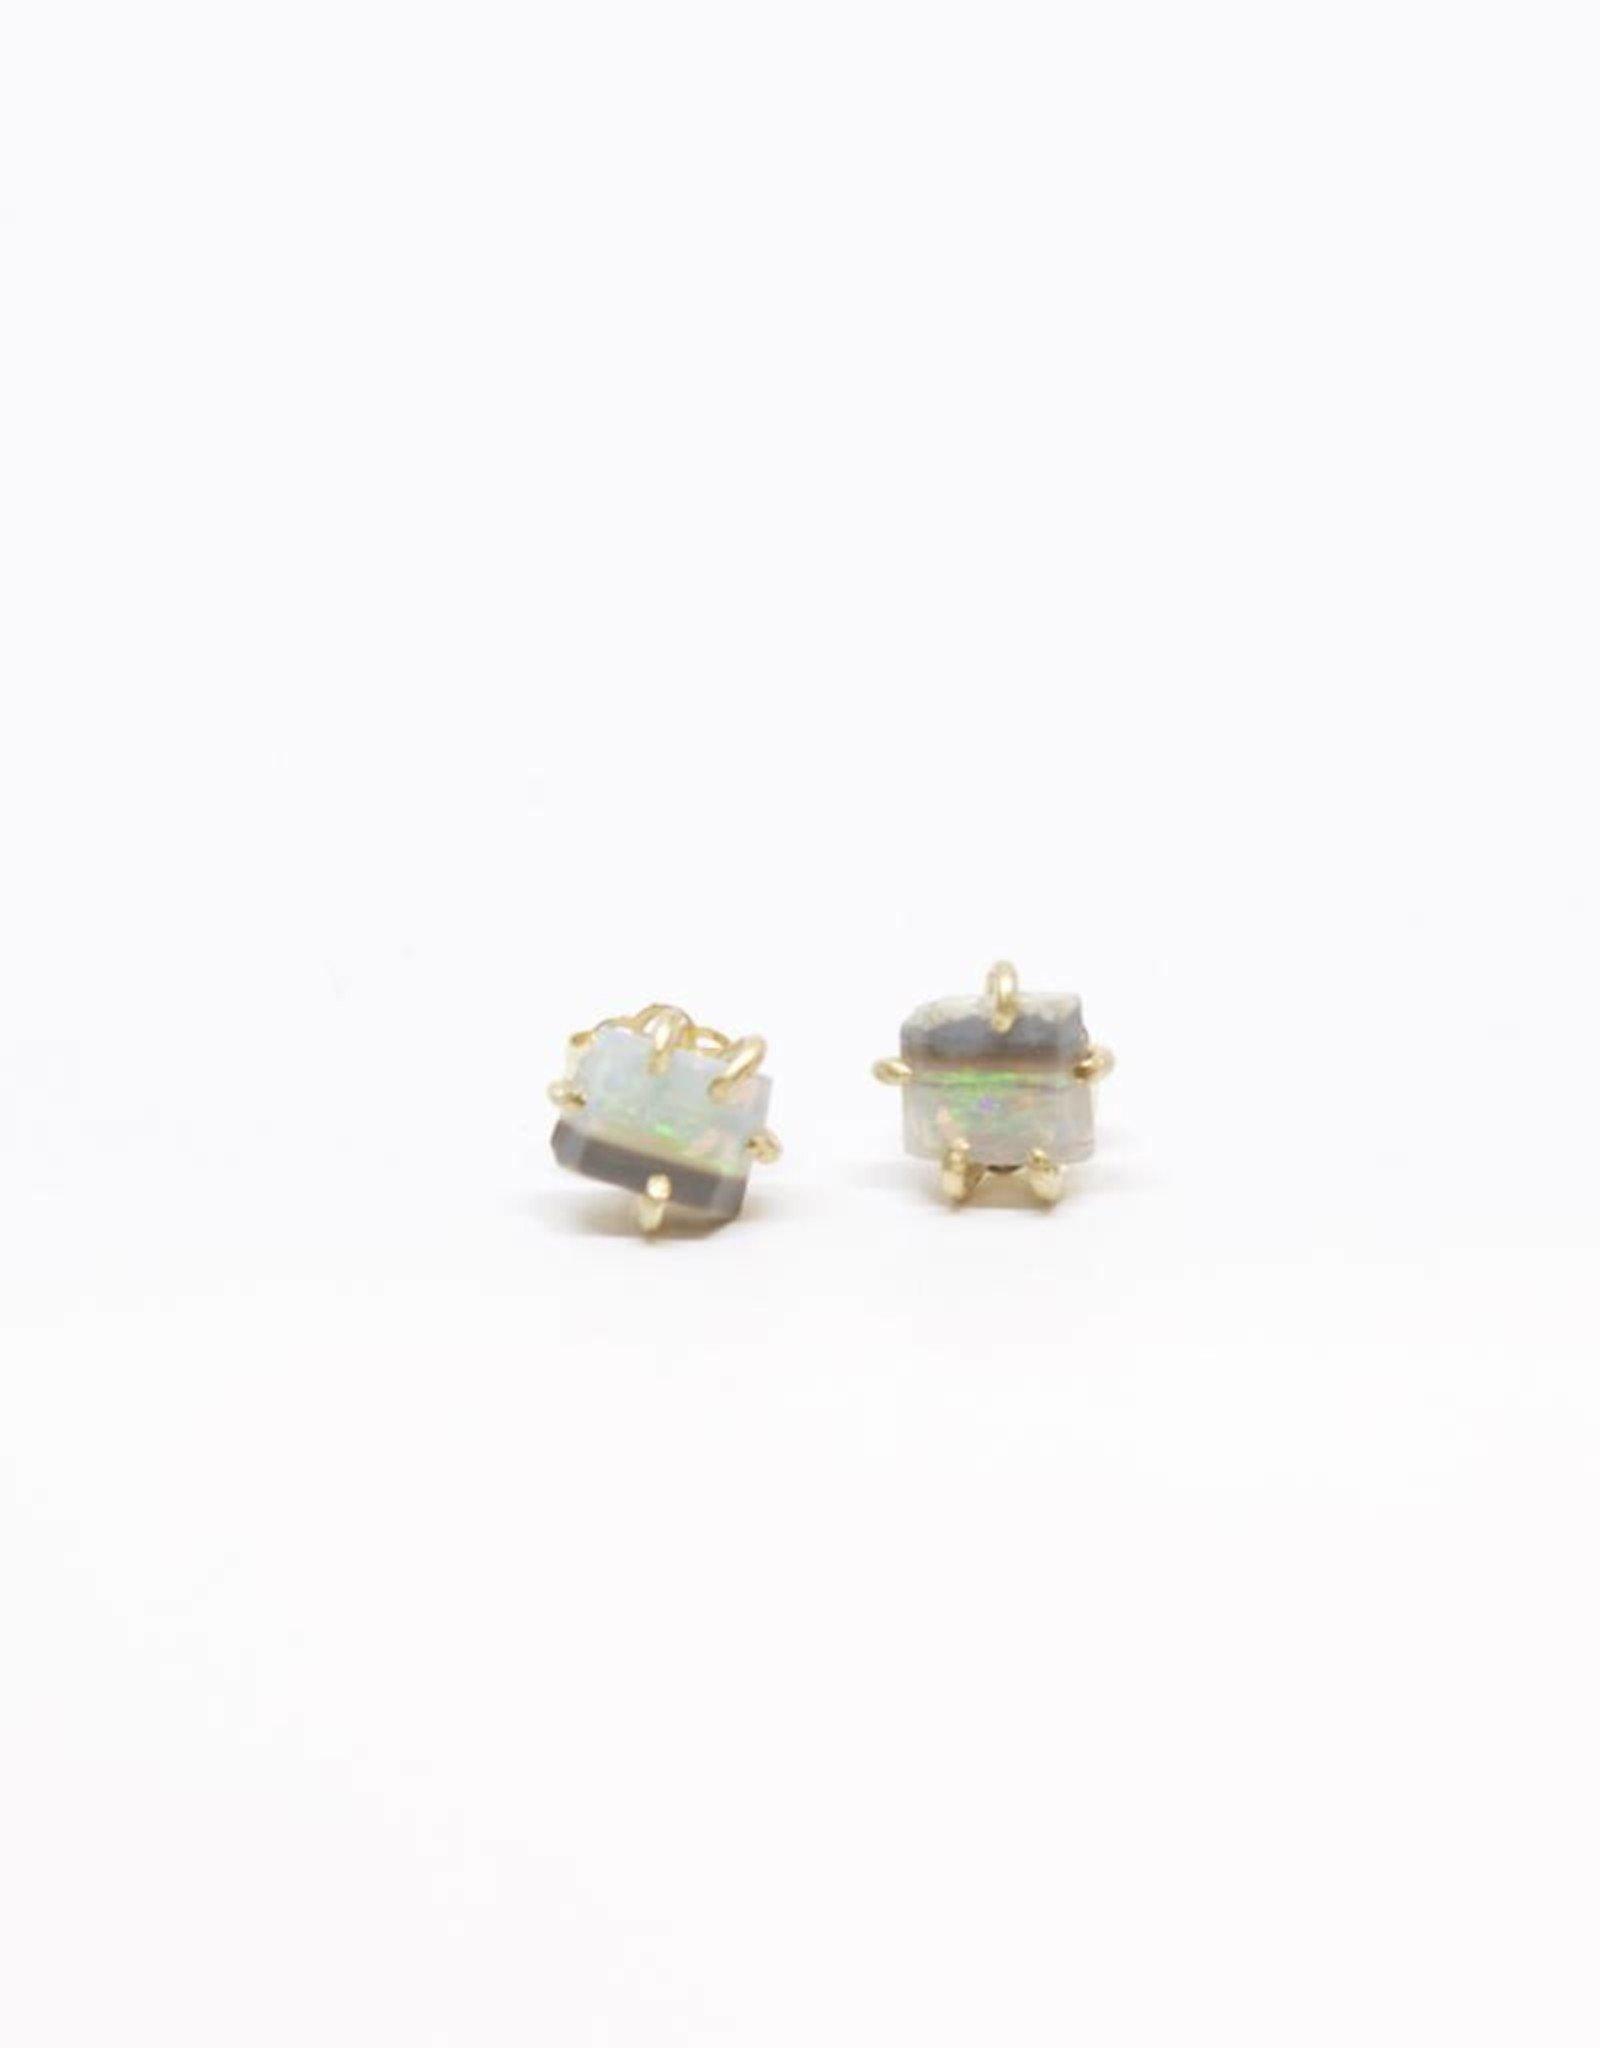 Variance Objects Australian Opal Small Studs